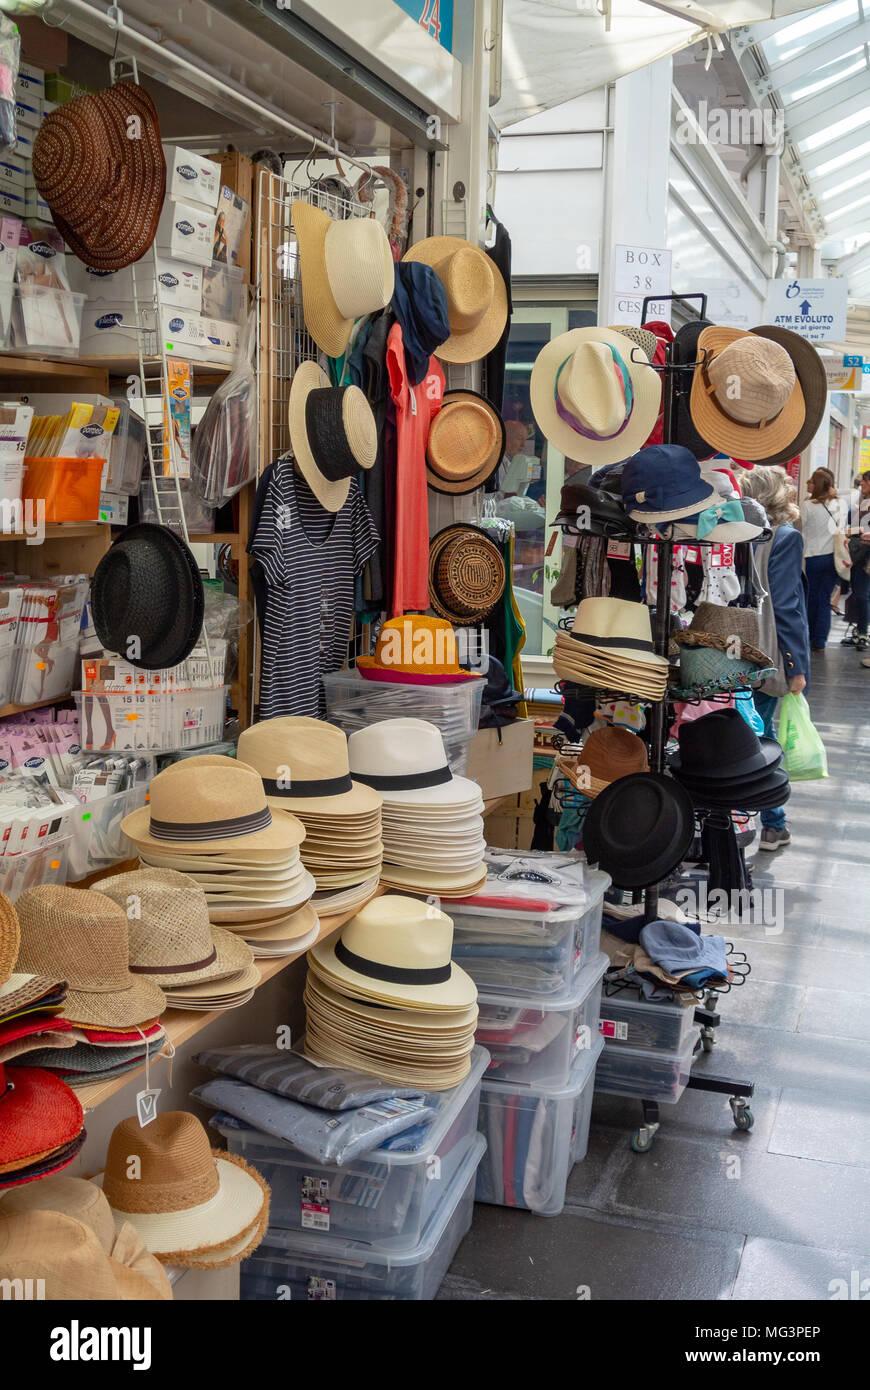 275cfe80 Italian Hat Shop Stock Photos & Italian Hat Shop Stock Images - Alamy